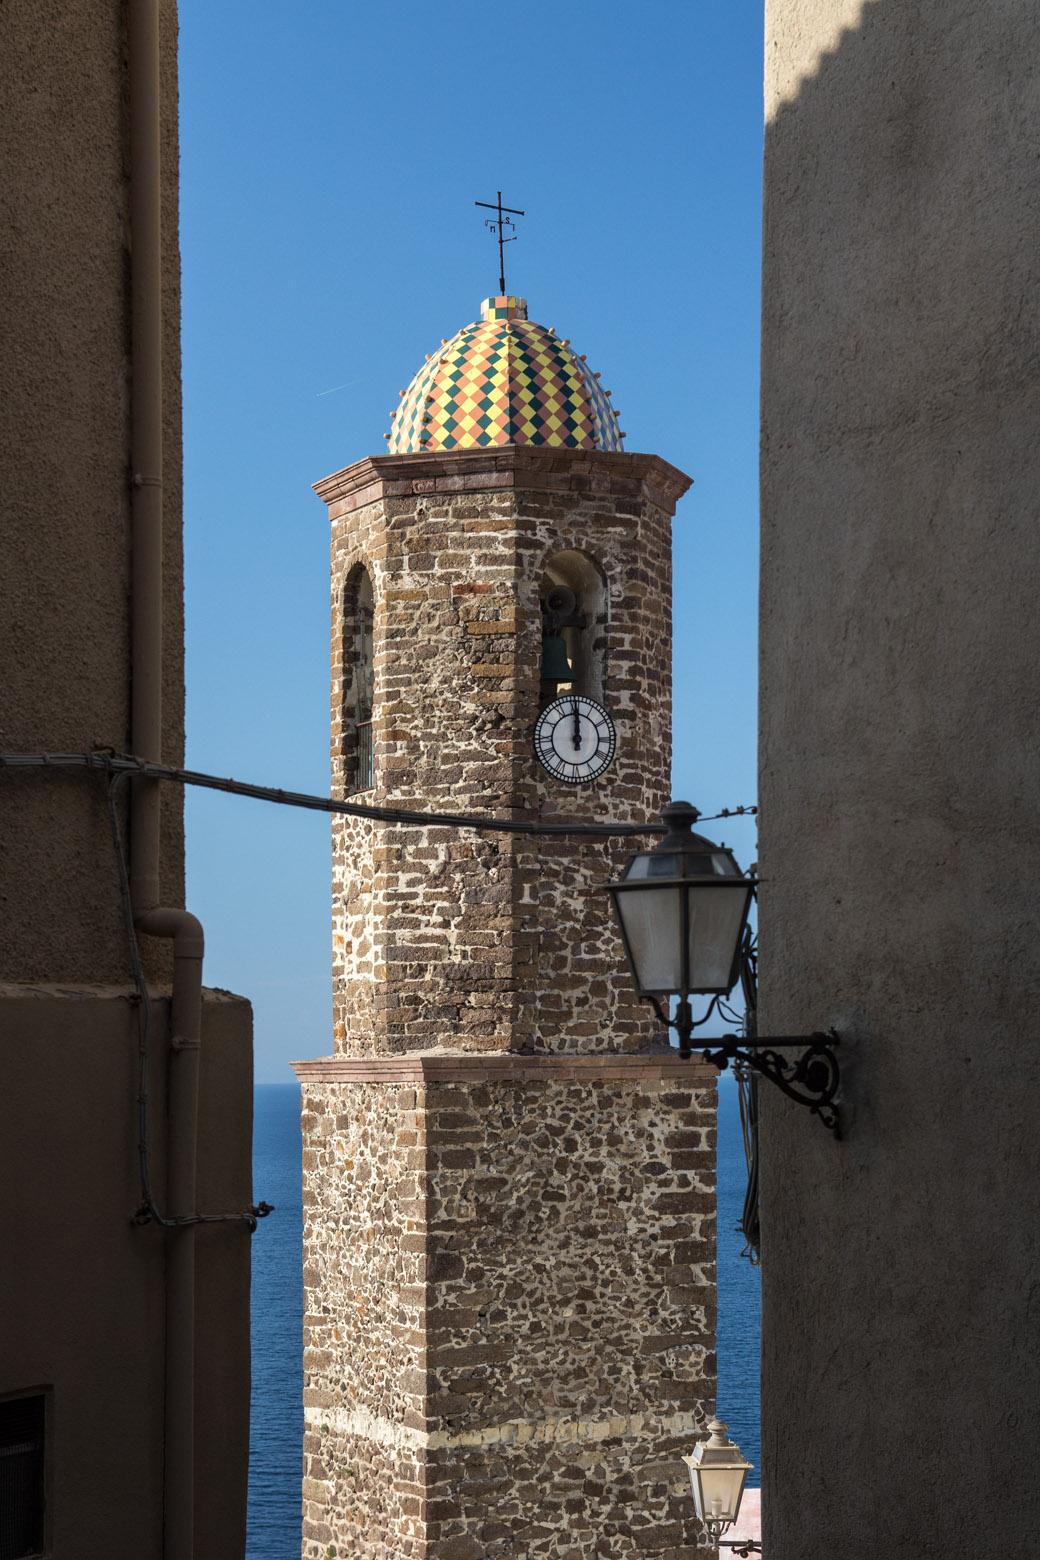 Castelsardo - Auch hier gibt es einen bunten Kirchturm.